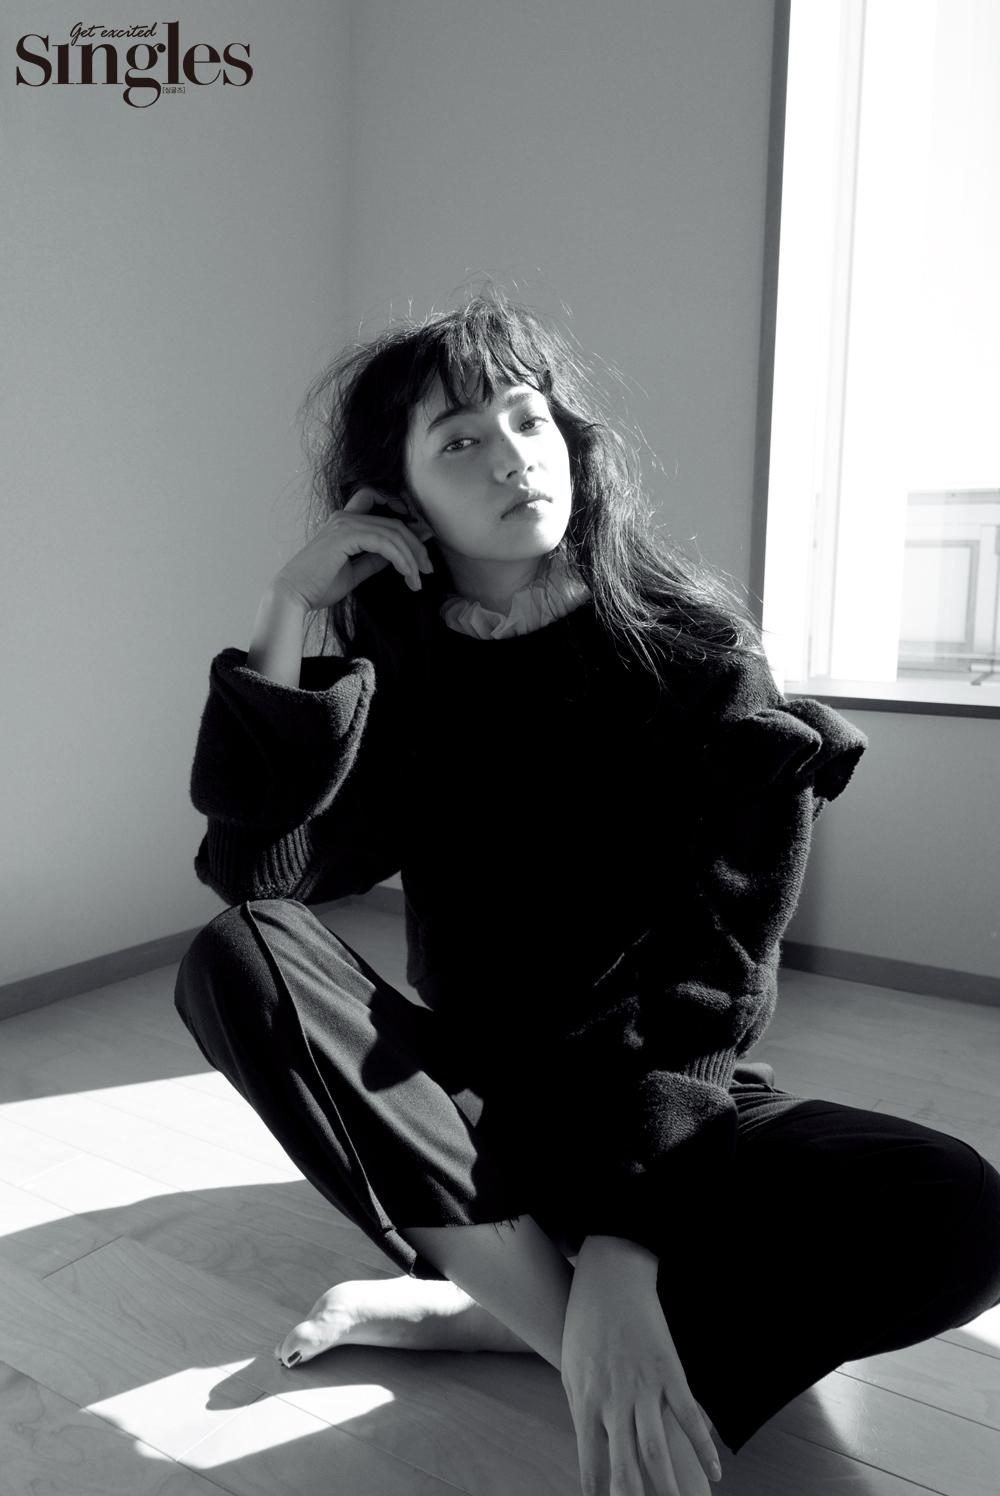 This 16-Year Old Model Looks Exactly Like Gisele Bündchen This 16-Year Old Model Looks Exactly Like Gisele Bündchen new photo